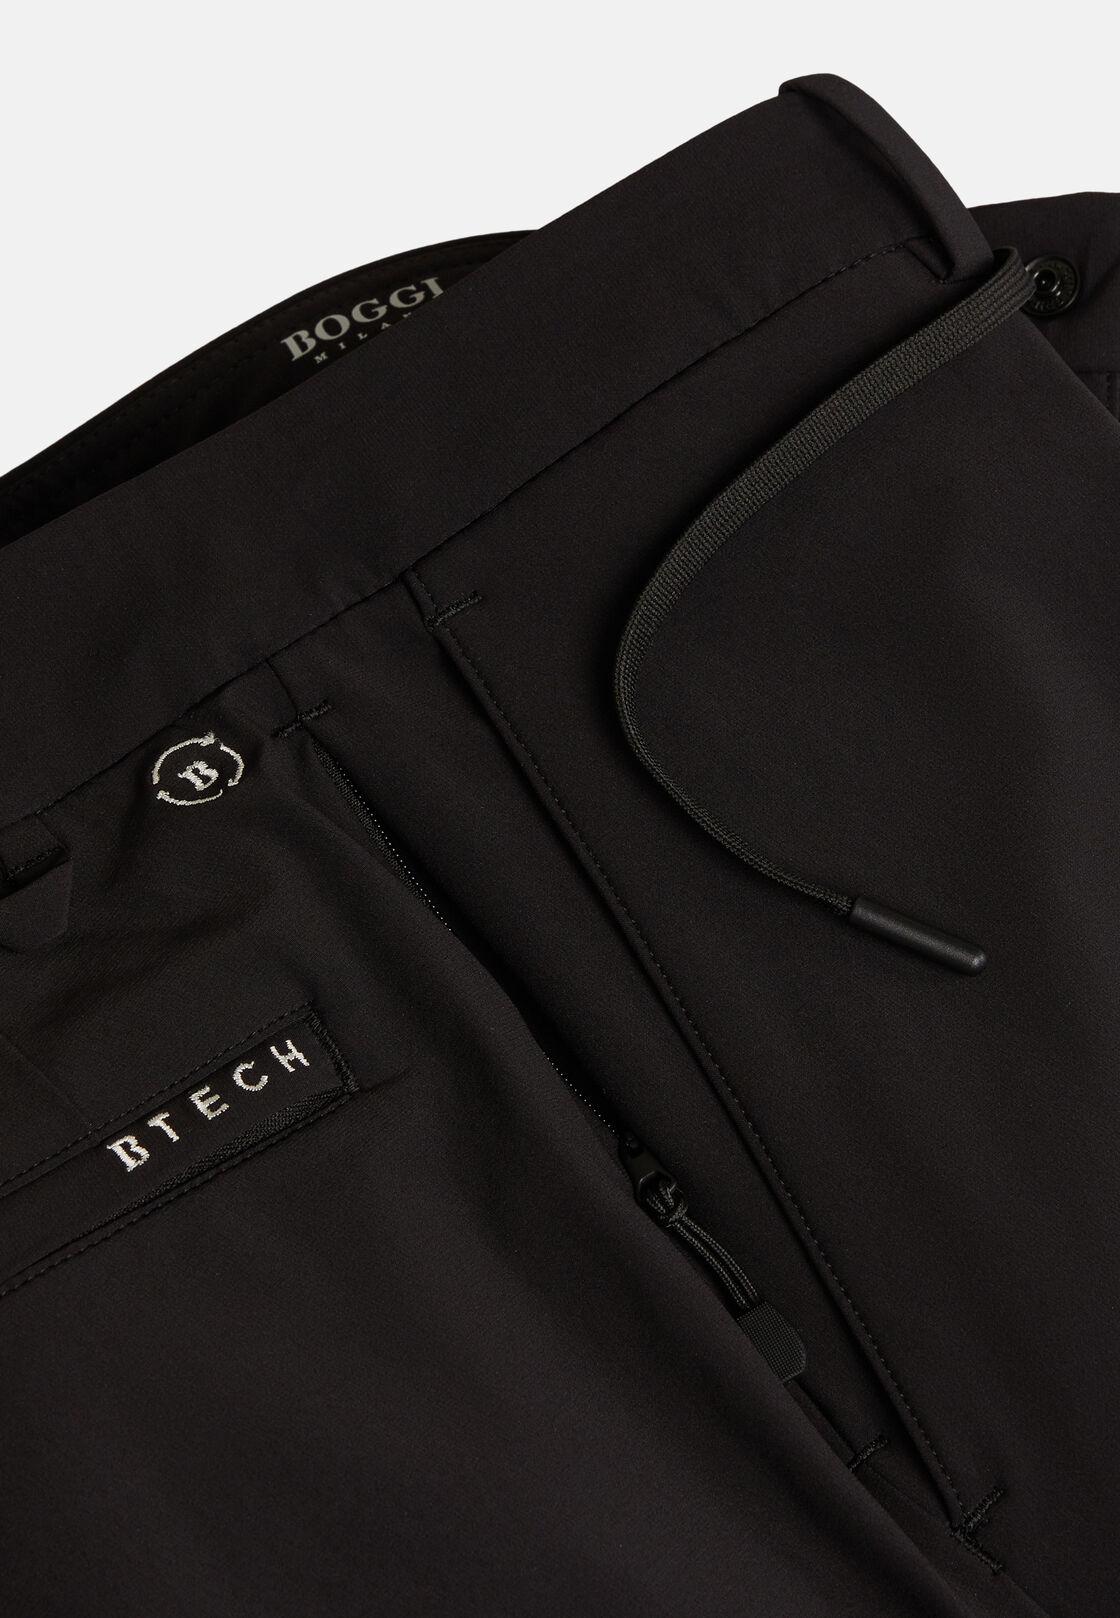 Hose aus elastischem recyceltem nylon b tech, Schwarz, hi-res